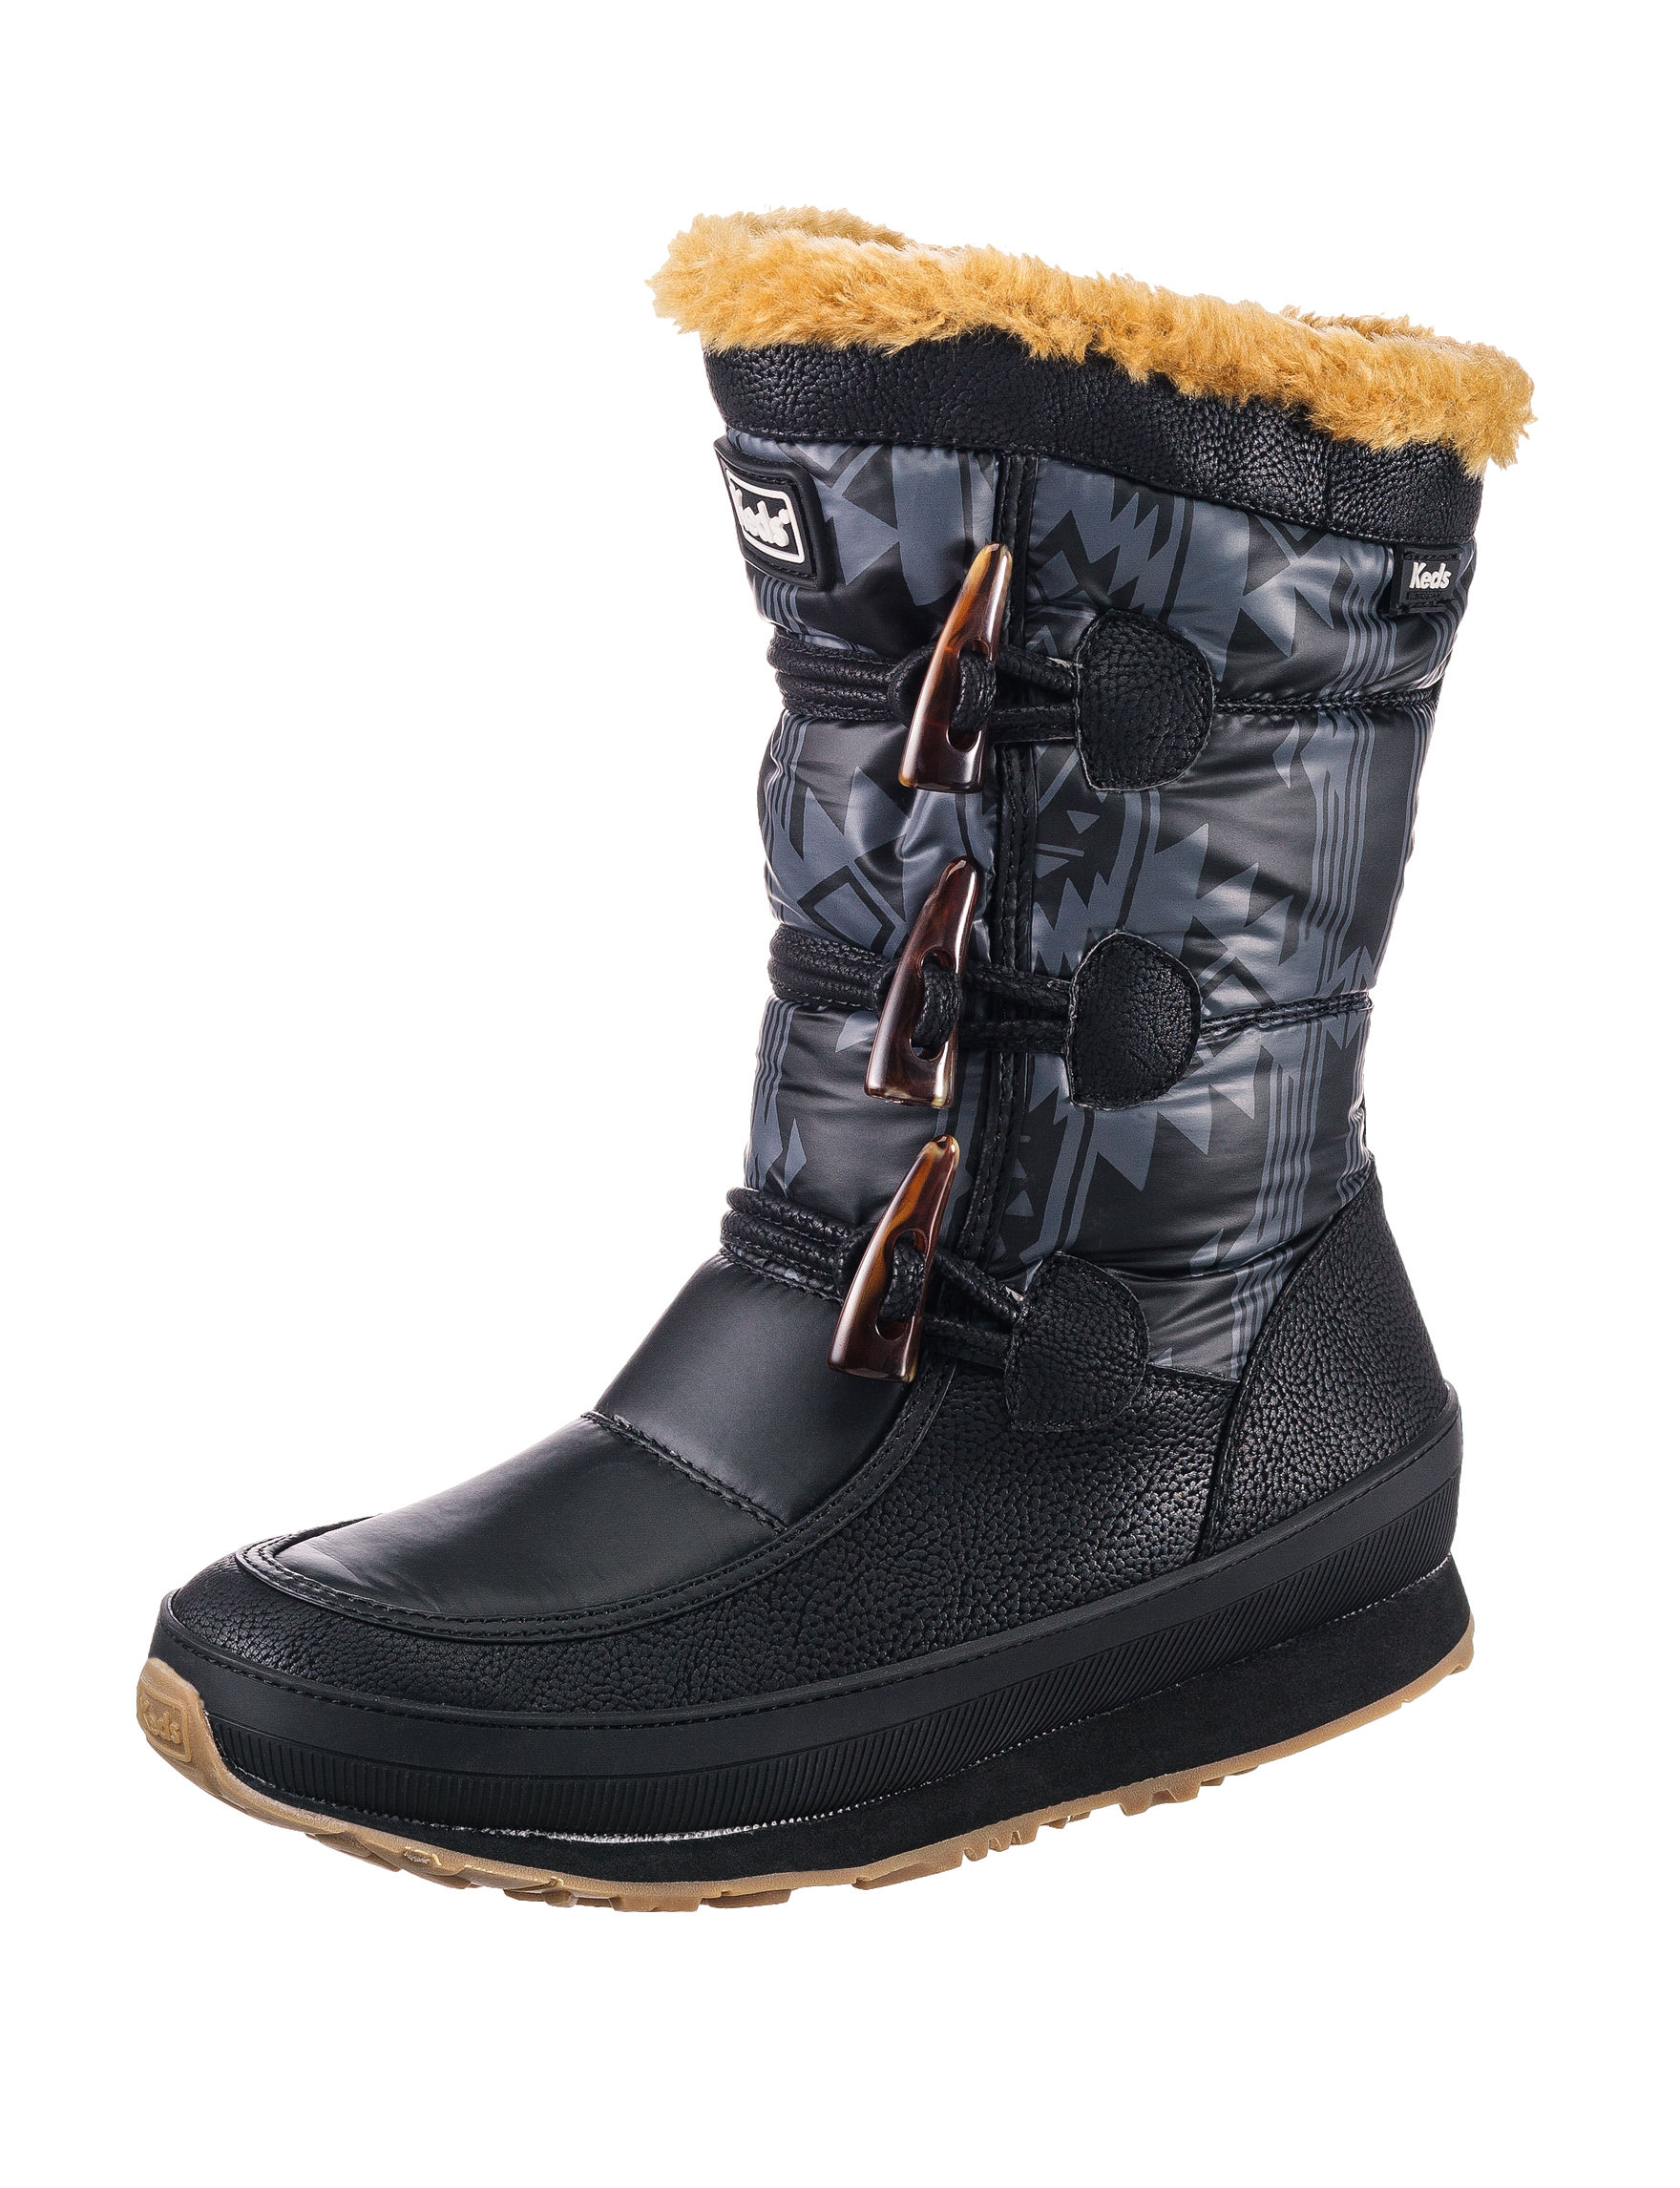 Keds Black Winter Boots